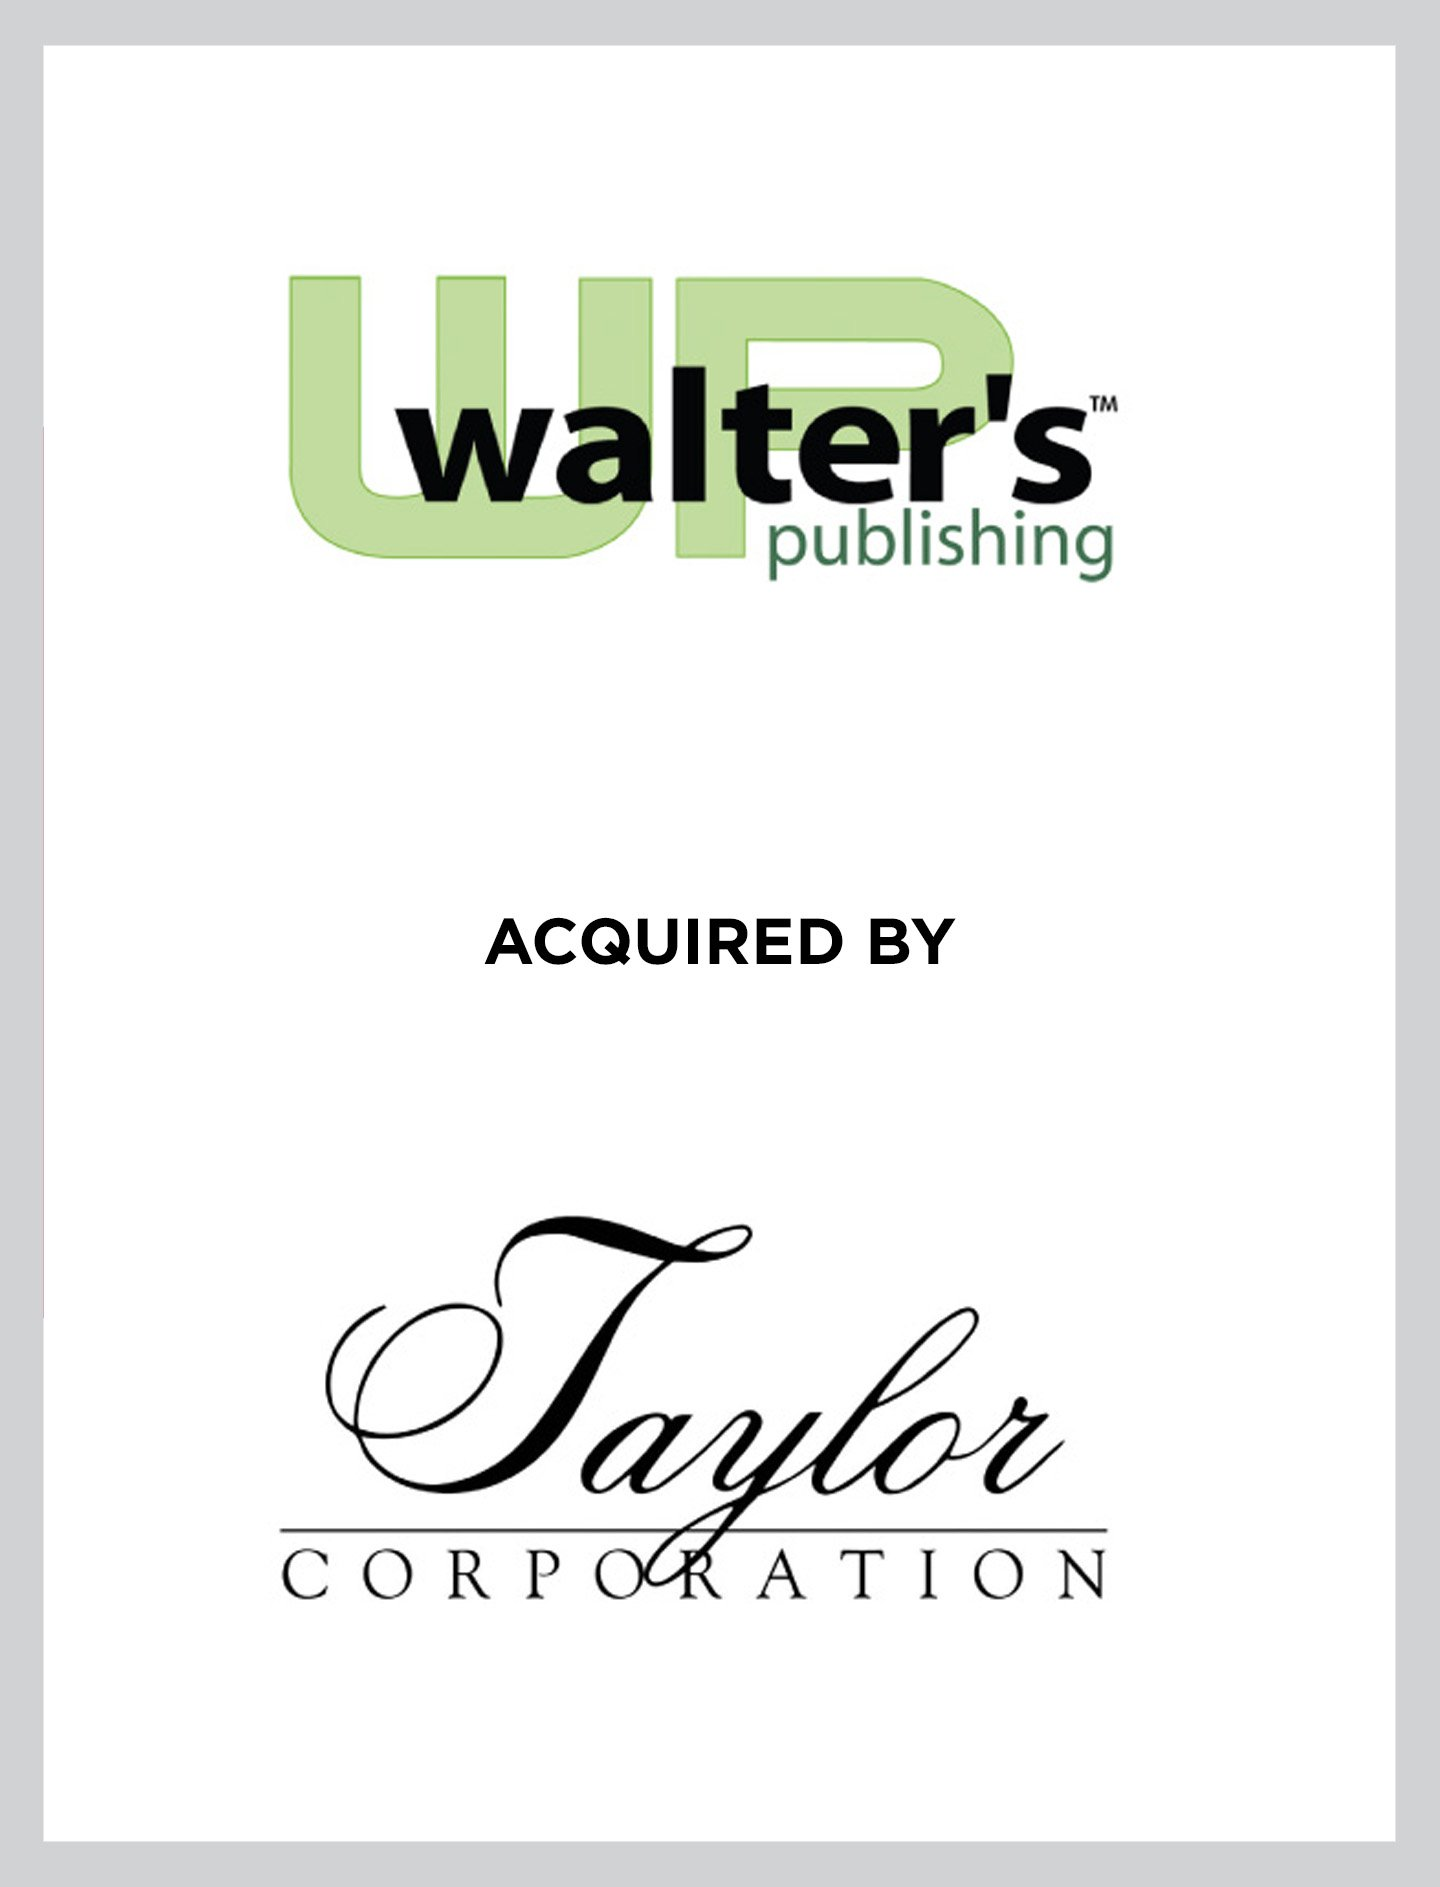 walters